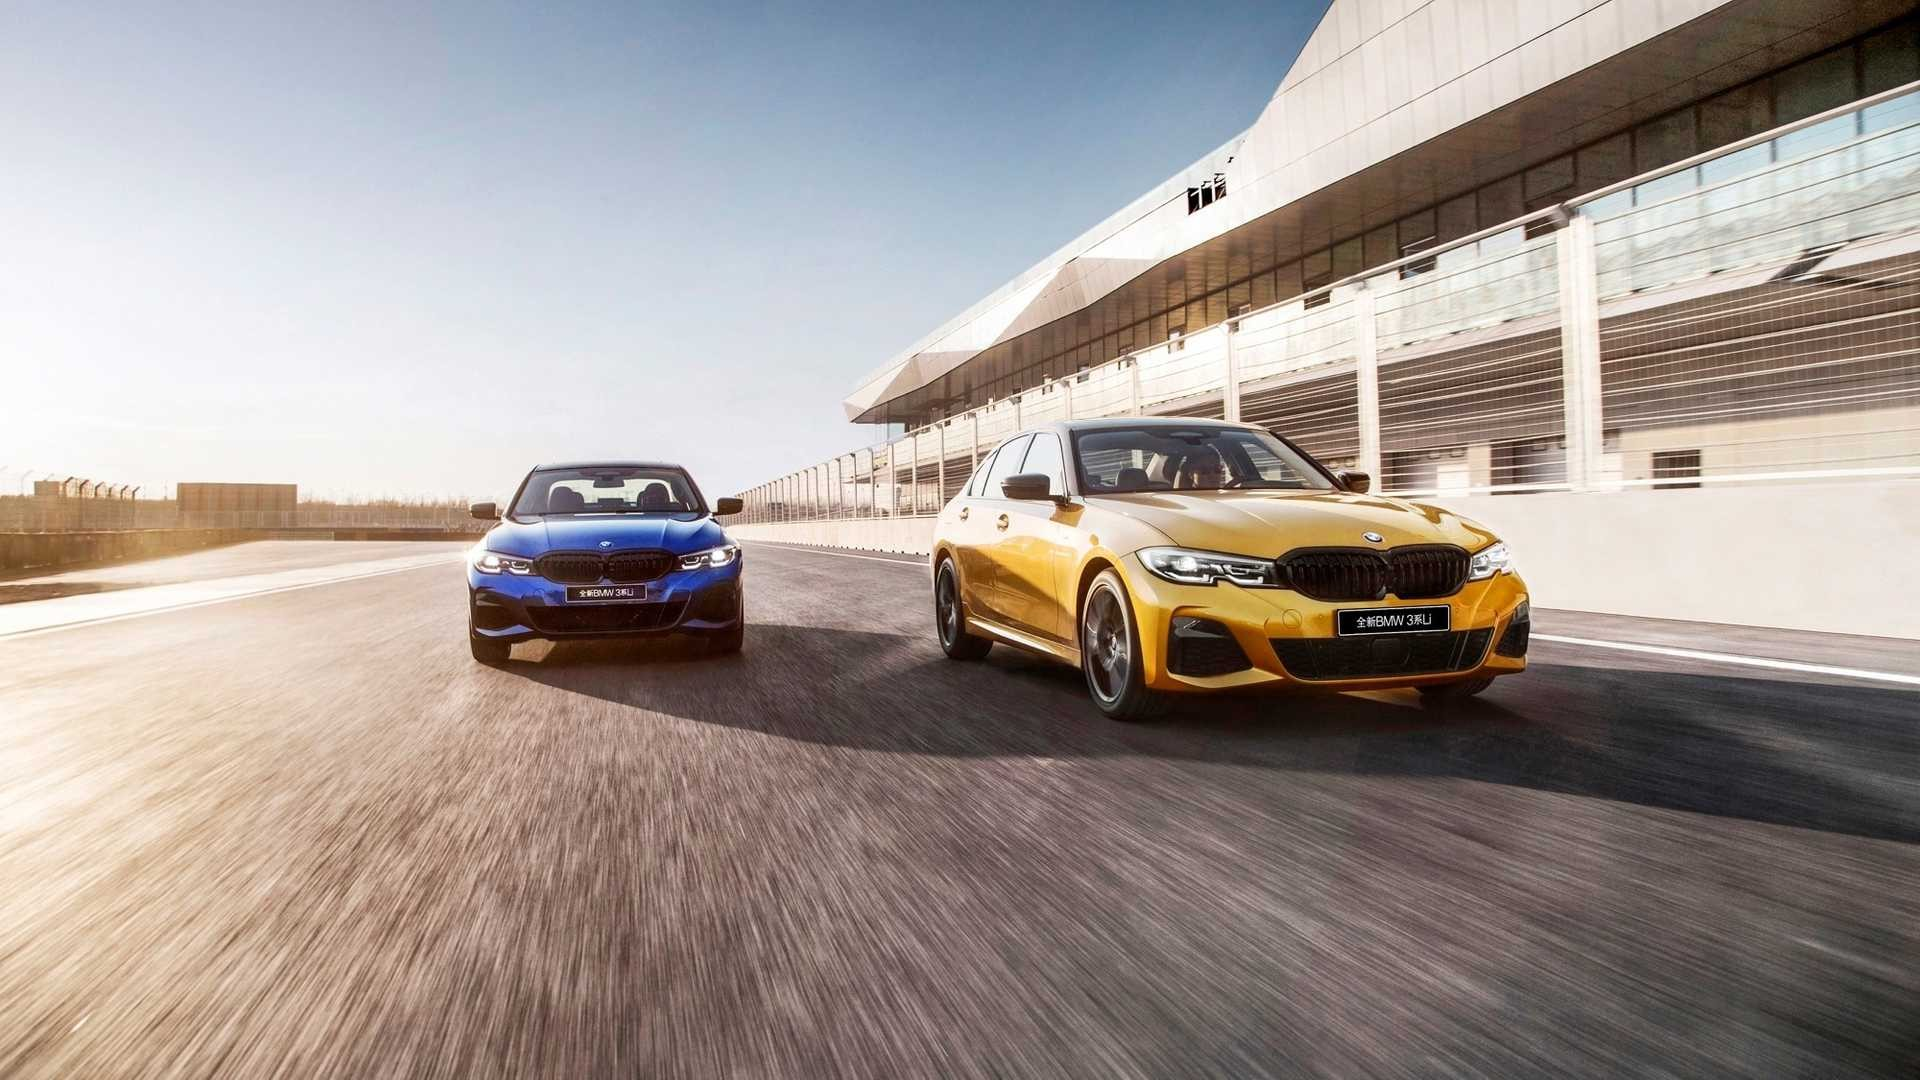 BMW-3-Series-LWB-Long-Wheelbase-2019-1